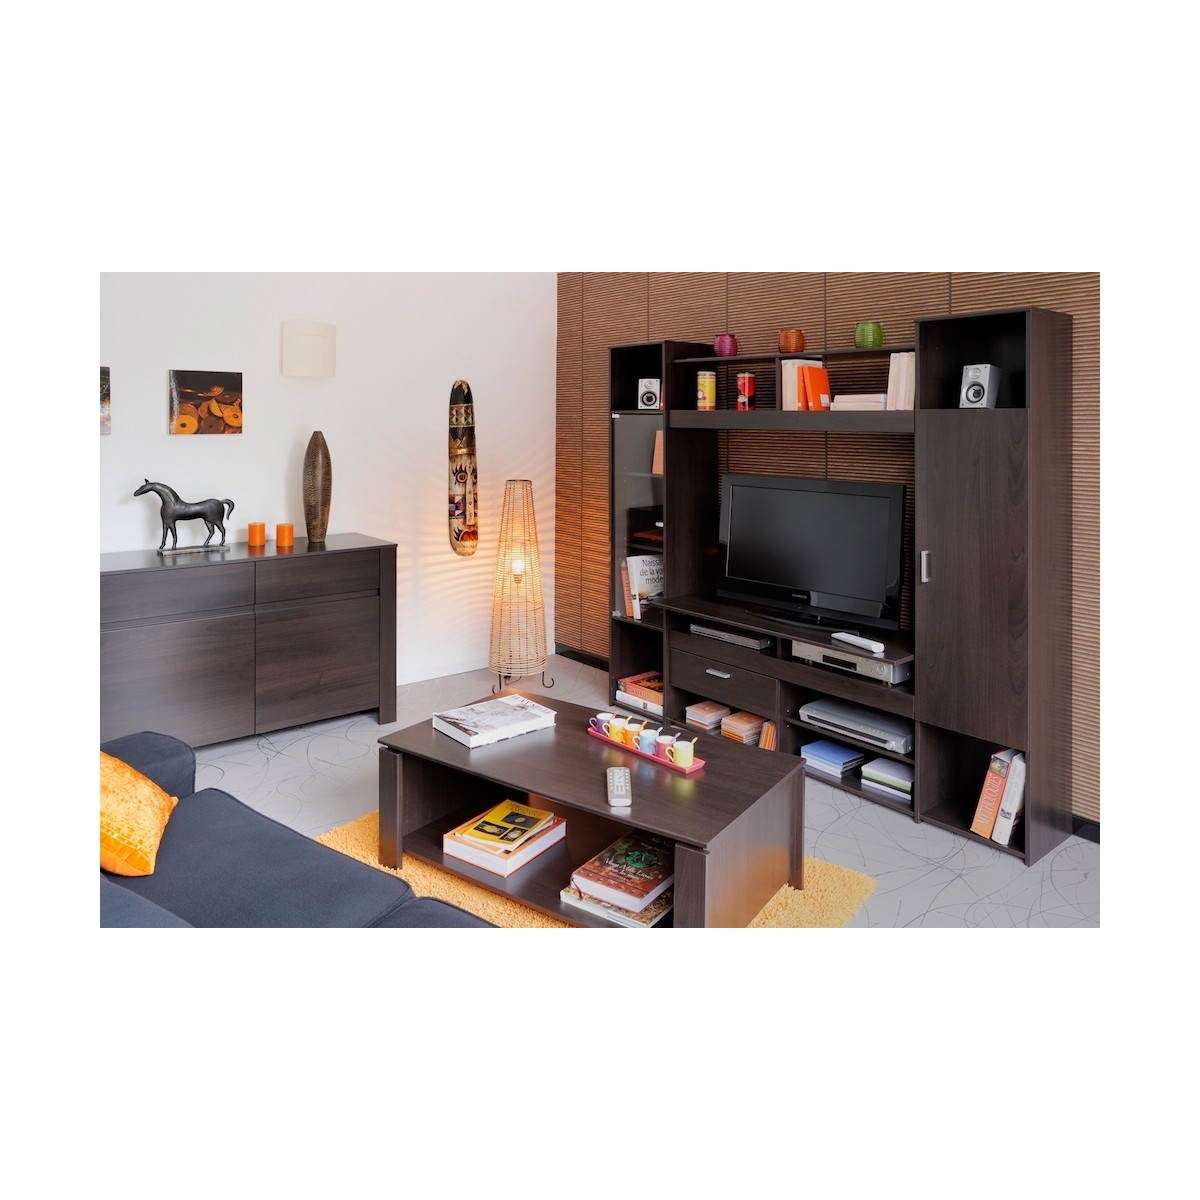 tv video hifi mobeldesign europa wenge amp story 3873